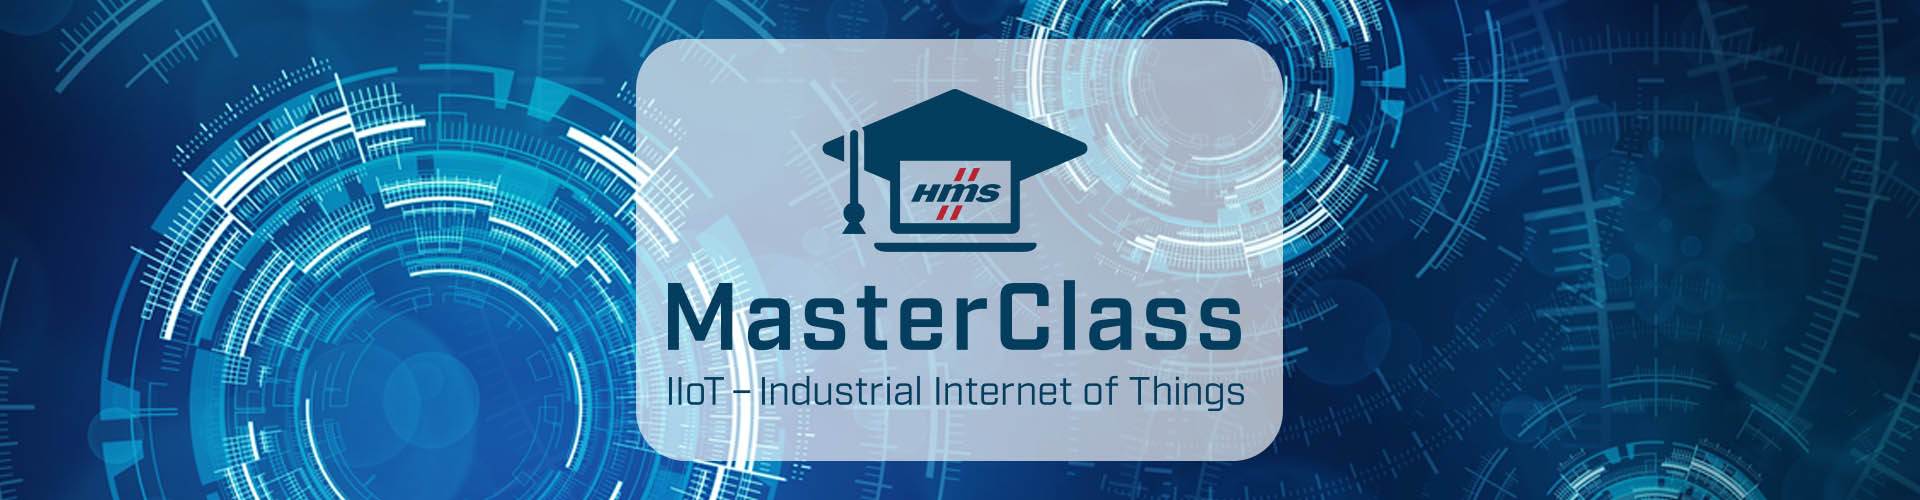 Slider MasterClass IIoT